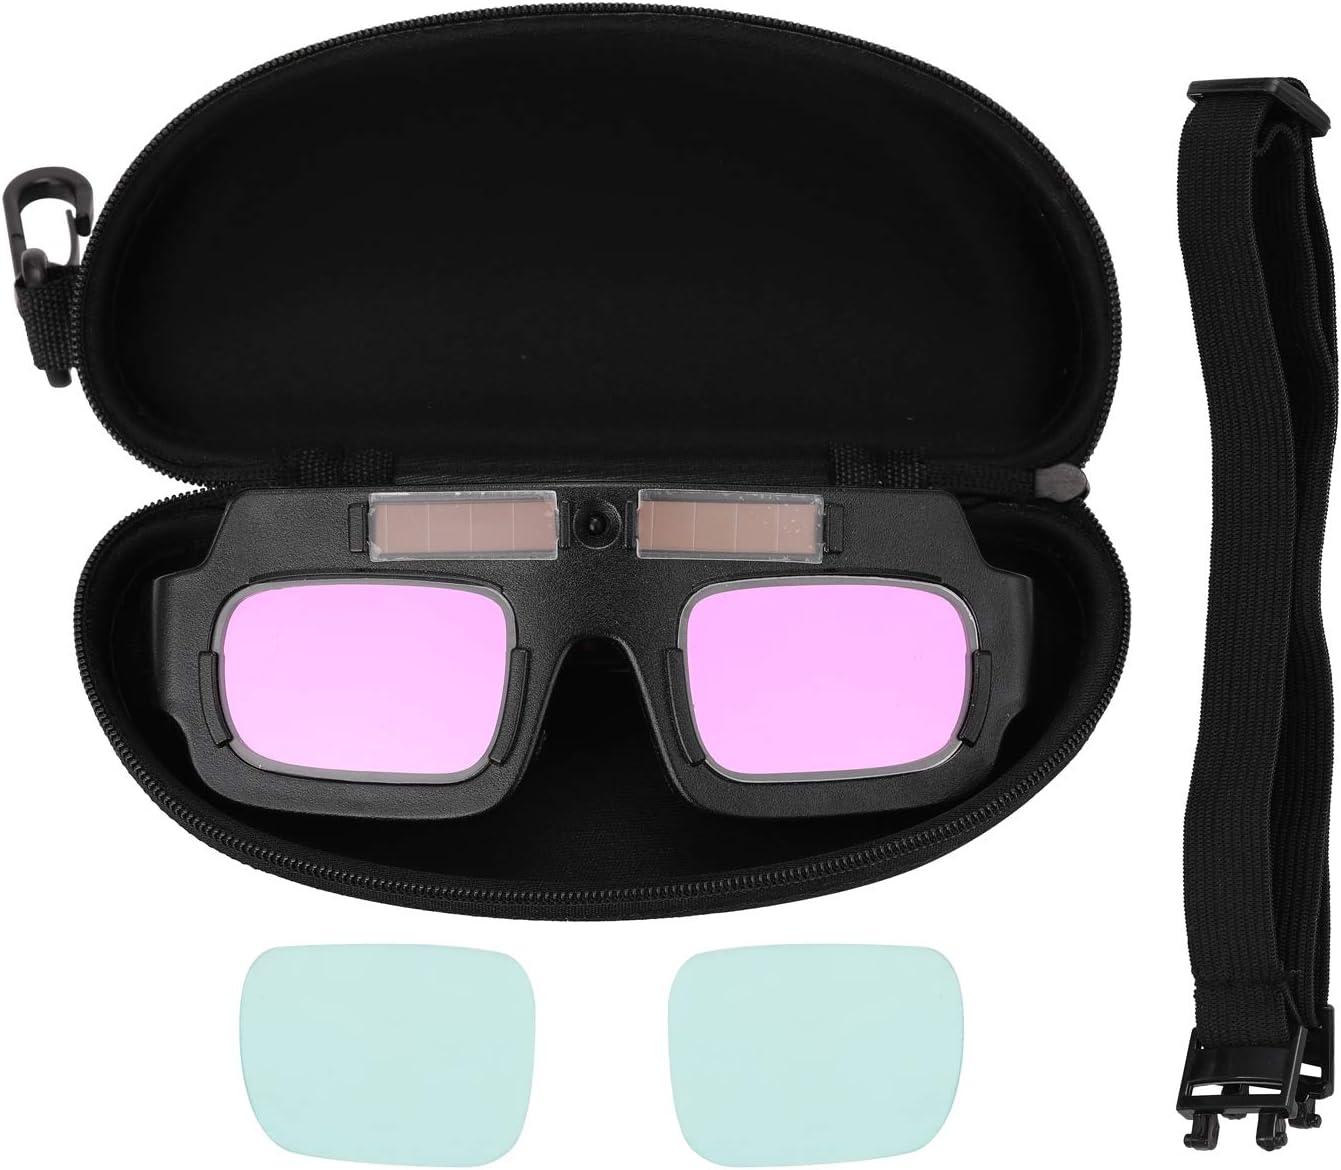 KKmoon Gafas de Soldadura Eléctrica,TIG Gafas Oscurecedoras Automáticas Solares,Gafas Antideslumbrantes Transparentes,Gafas Anti-Arco TX-012S